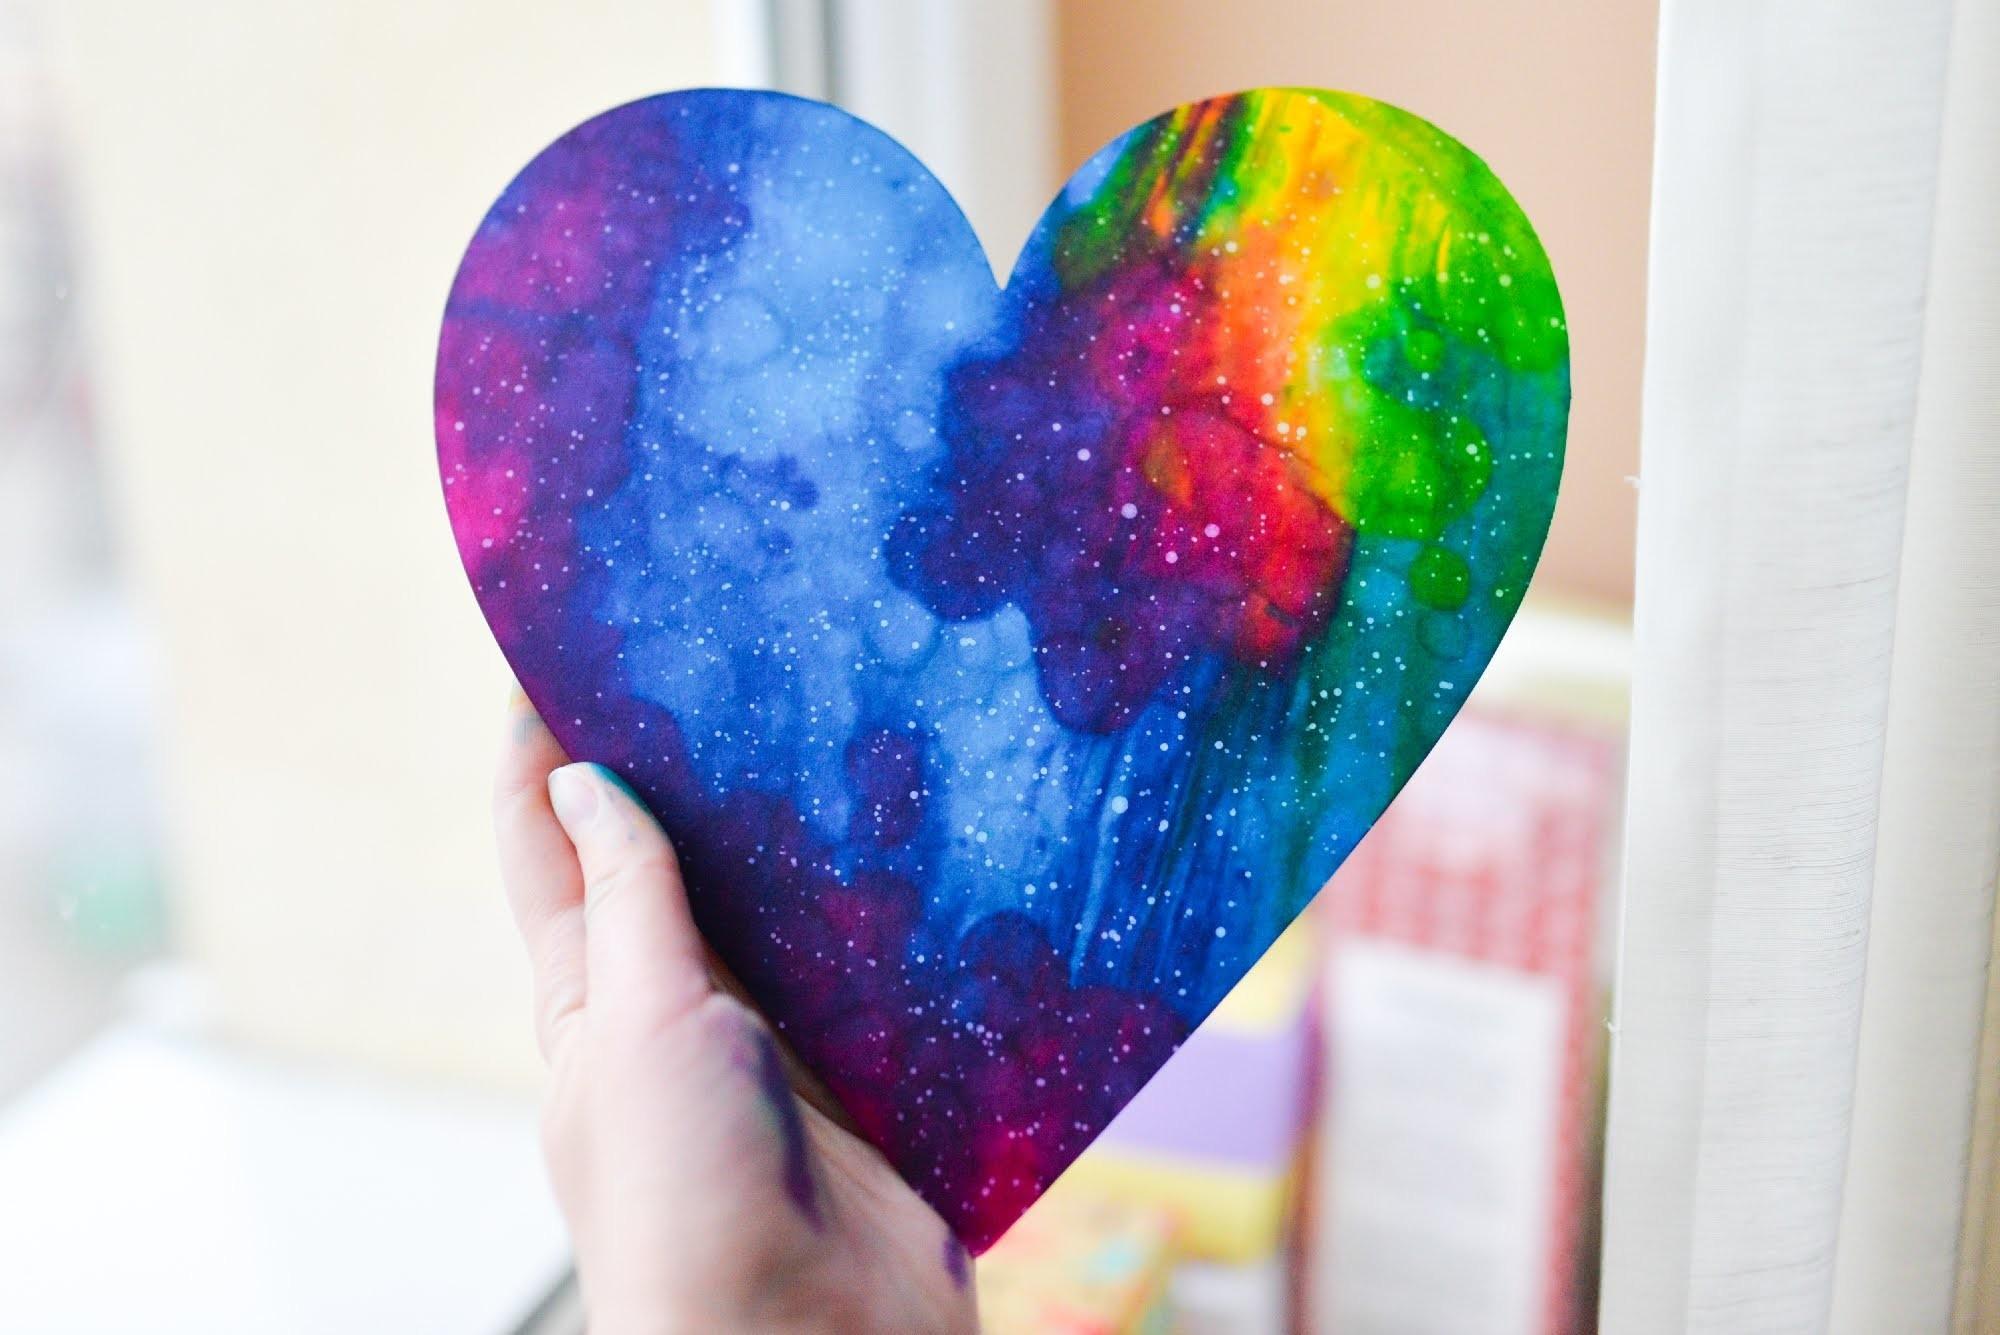 How to Make - Watercolor Galaxy Heart Valentine's Day - Step by Step | Serce Kosmos Galaktyka